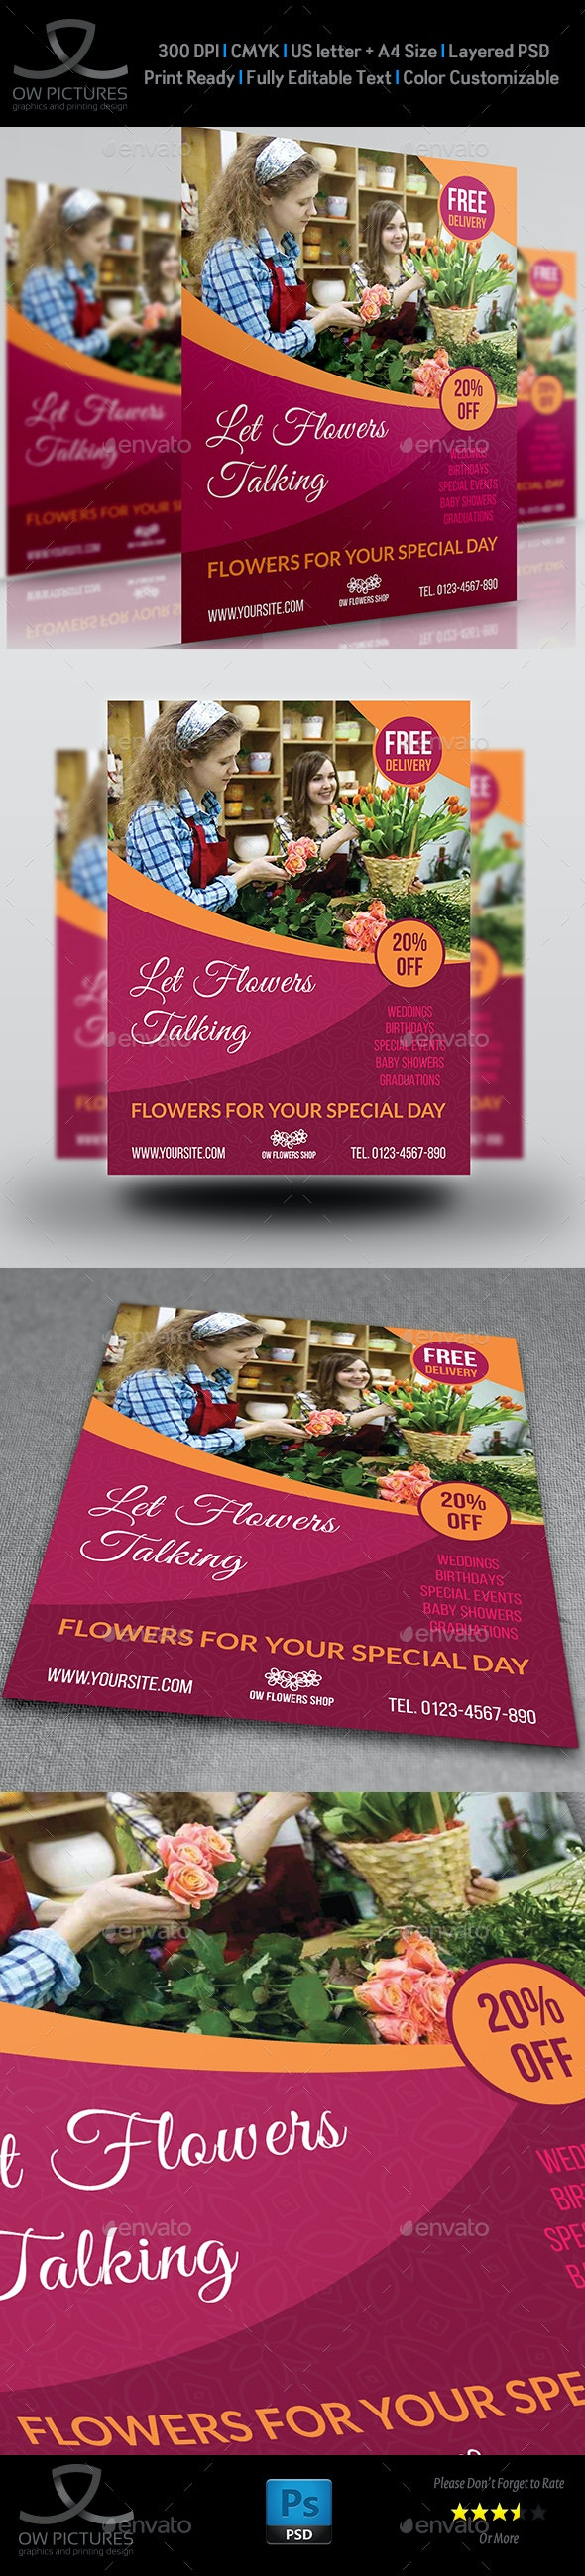 Flower Shop Flyer Template Vol.2 - Flyers Print Templates